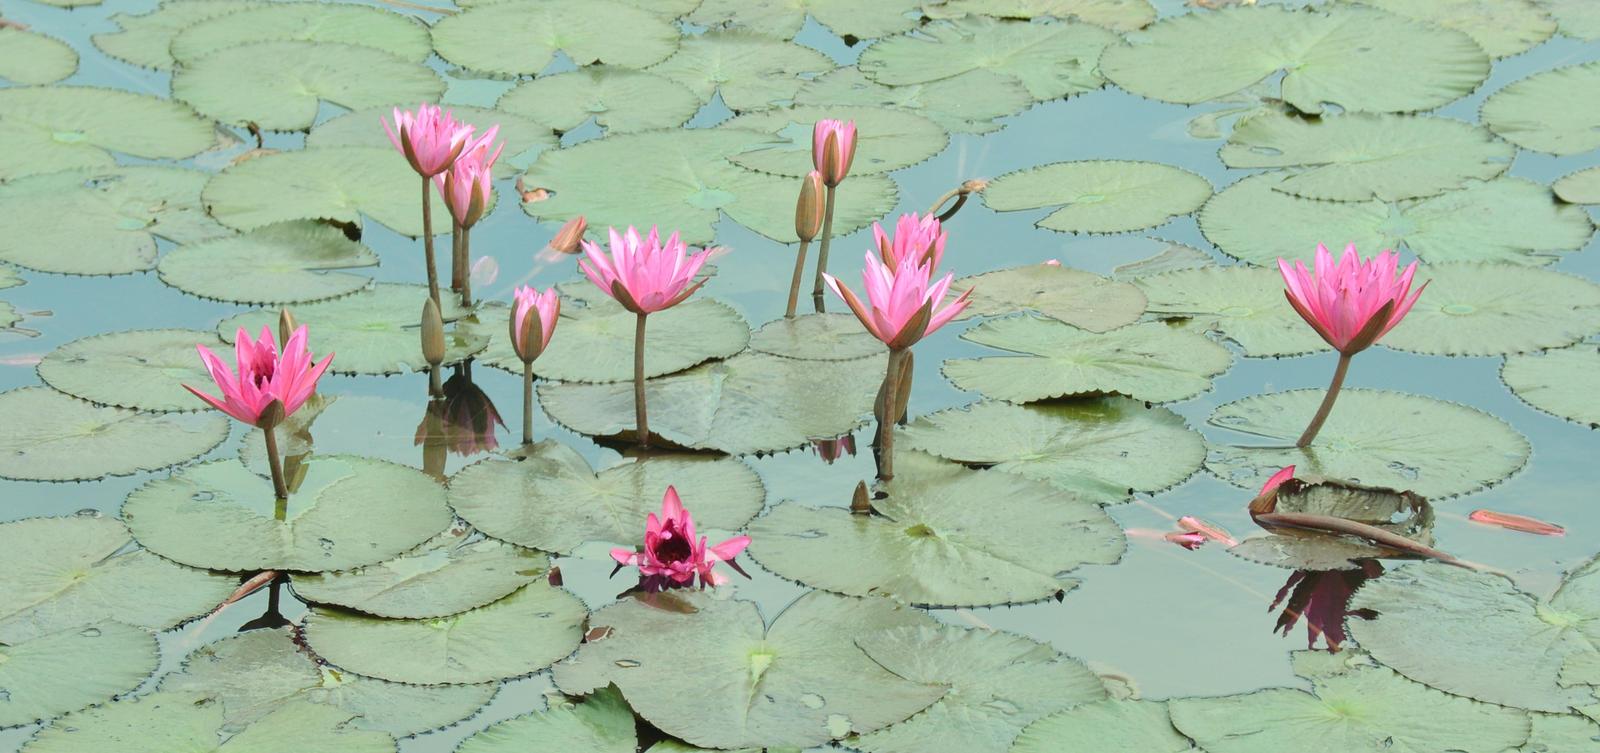 Lotus Flower Pond In Philippines By Sica Chan12 On Deviantart